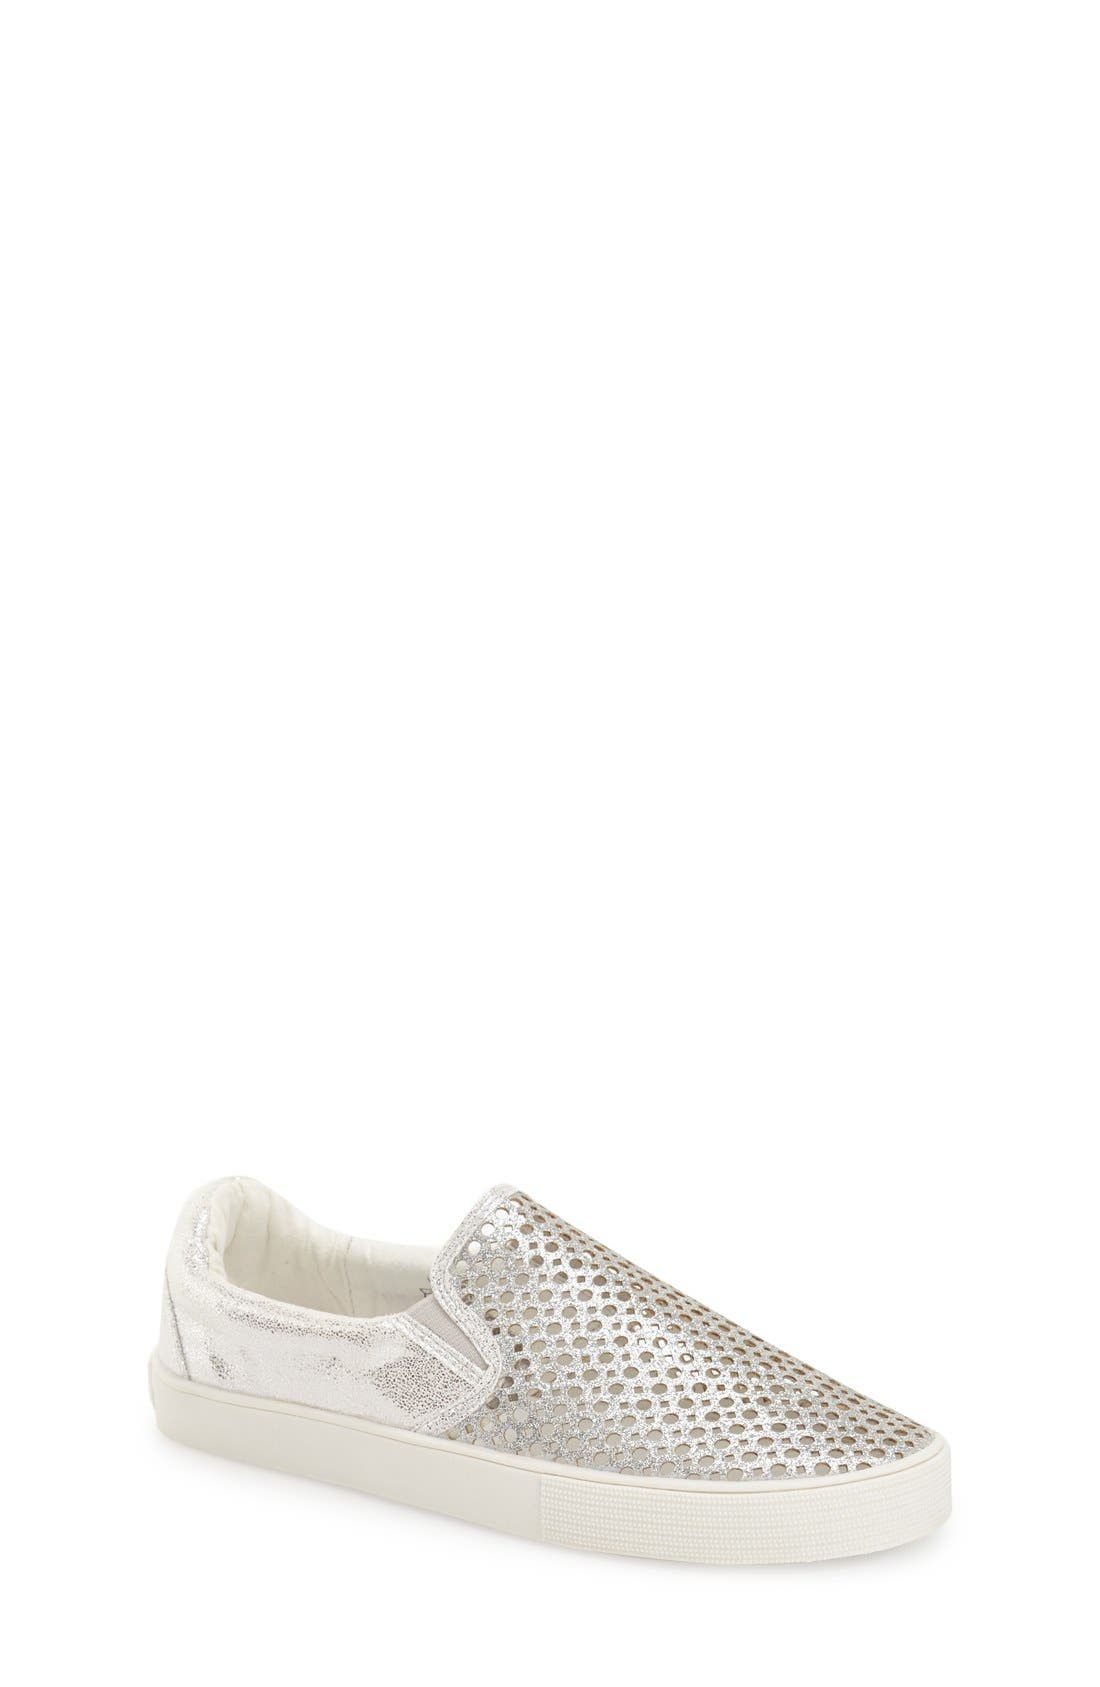 STUART WEITZMAN 'Vance' Slip-On Sneaker